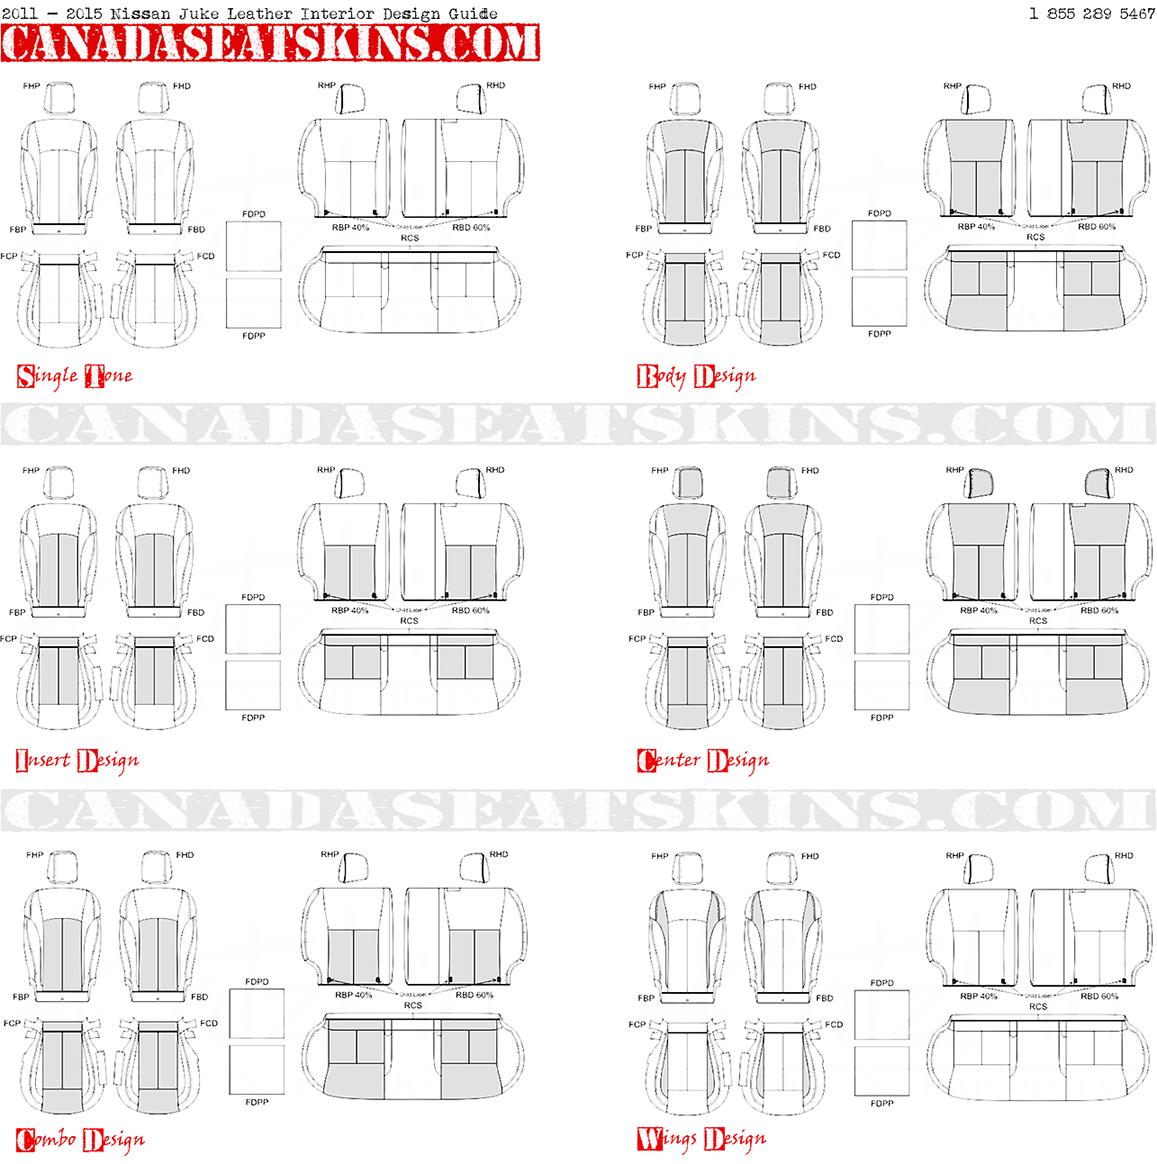 2001 lexus gs300 stereo wiring diagram  lexus  auto wiring